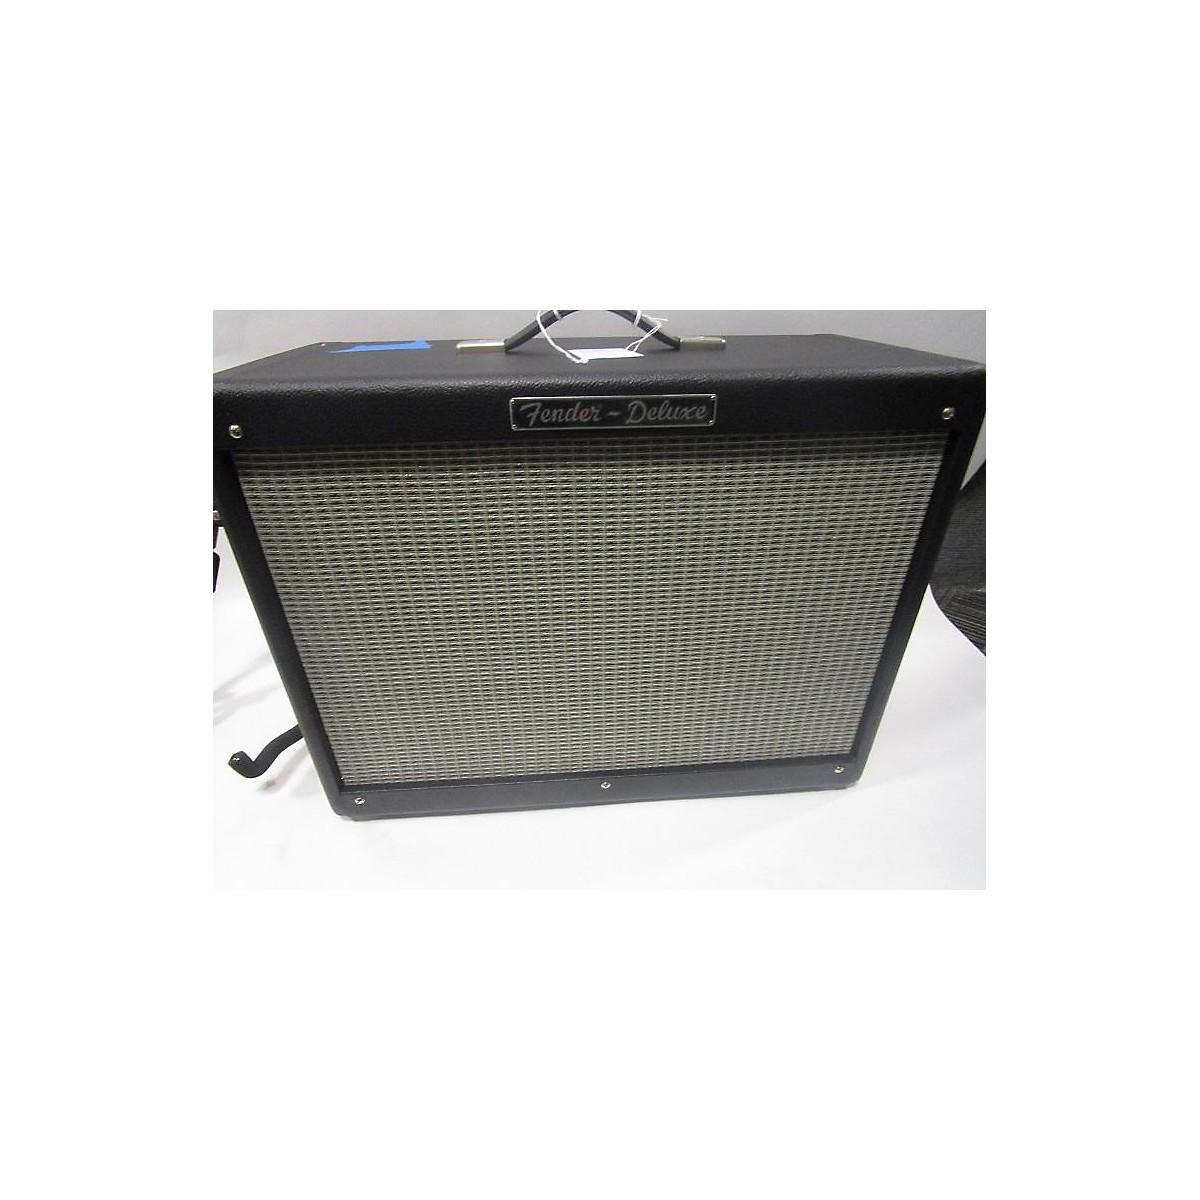 Fender Hot Rod Deluxe 112 Guitar Cab Guitar Cabinet